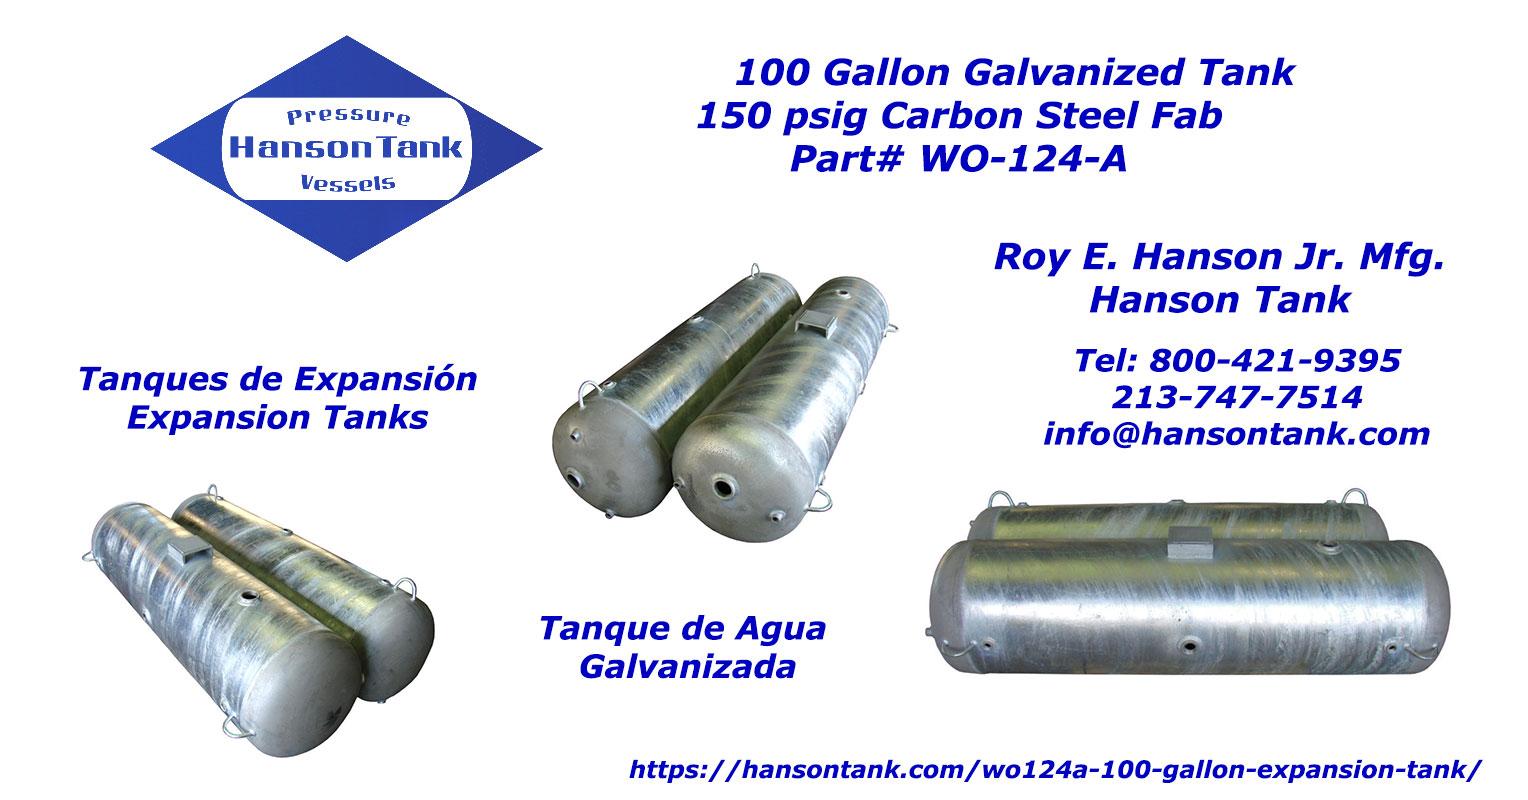 WO-124-A galvanized water tanks